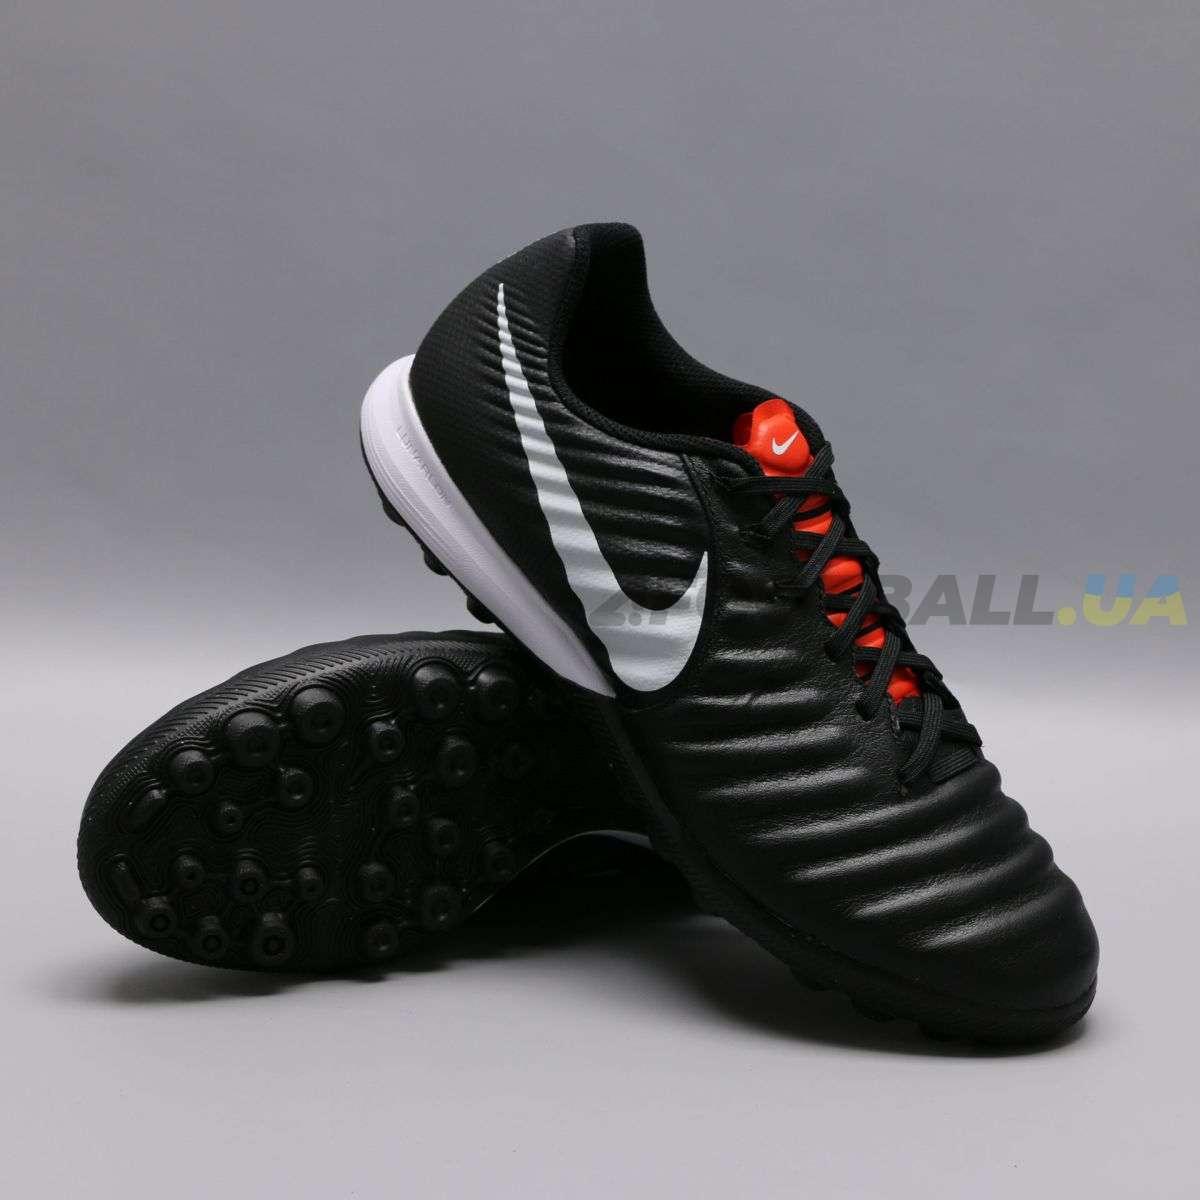 16d7e703 Сороконожки Nike Tiempo Lunar Legend Pro AH7249-006 купить на ...